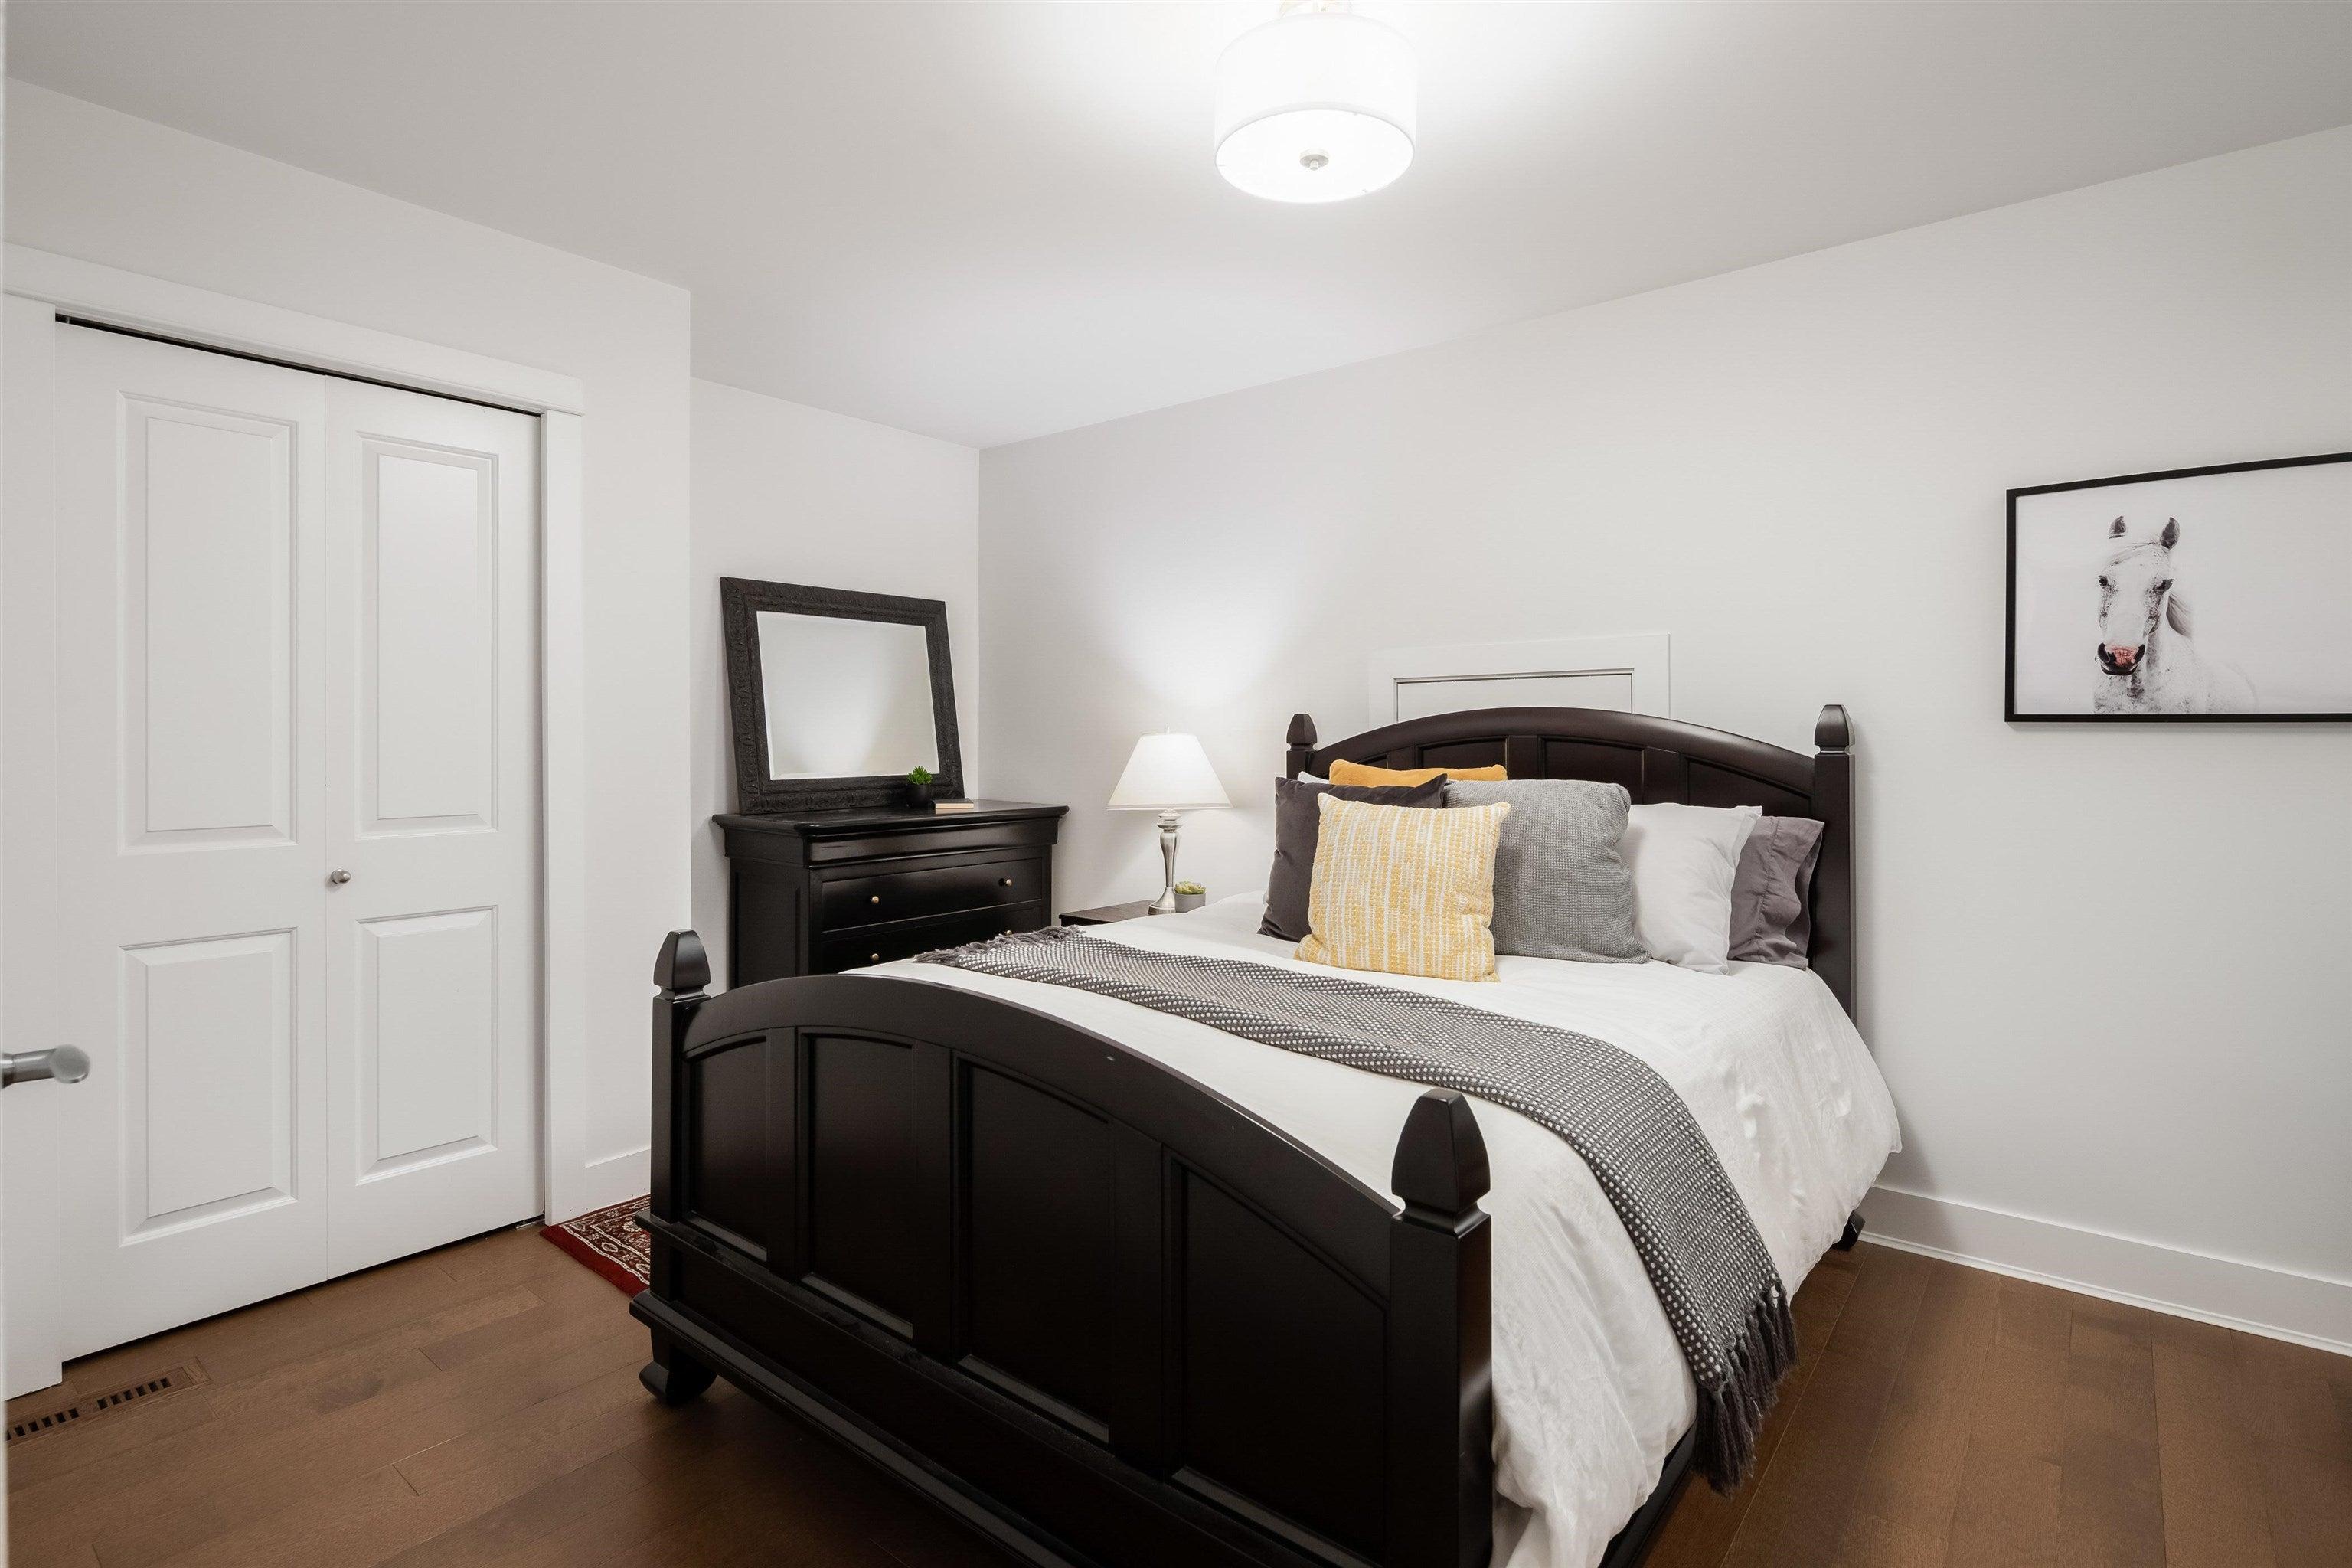 2258 WINDRIDGE DRIVE - Seymour NV House/Single Family for sale, 5 Bedrooms (R2617156) - #25